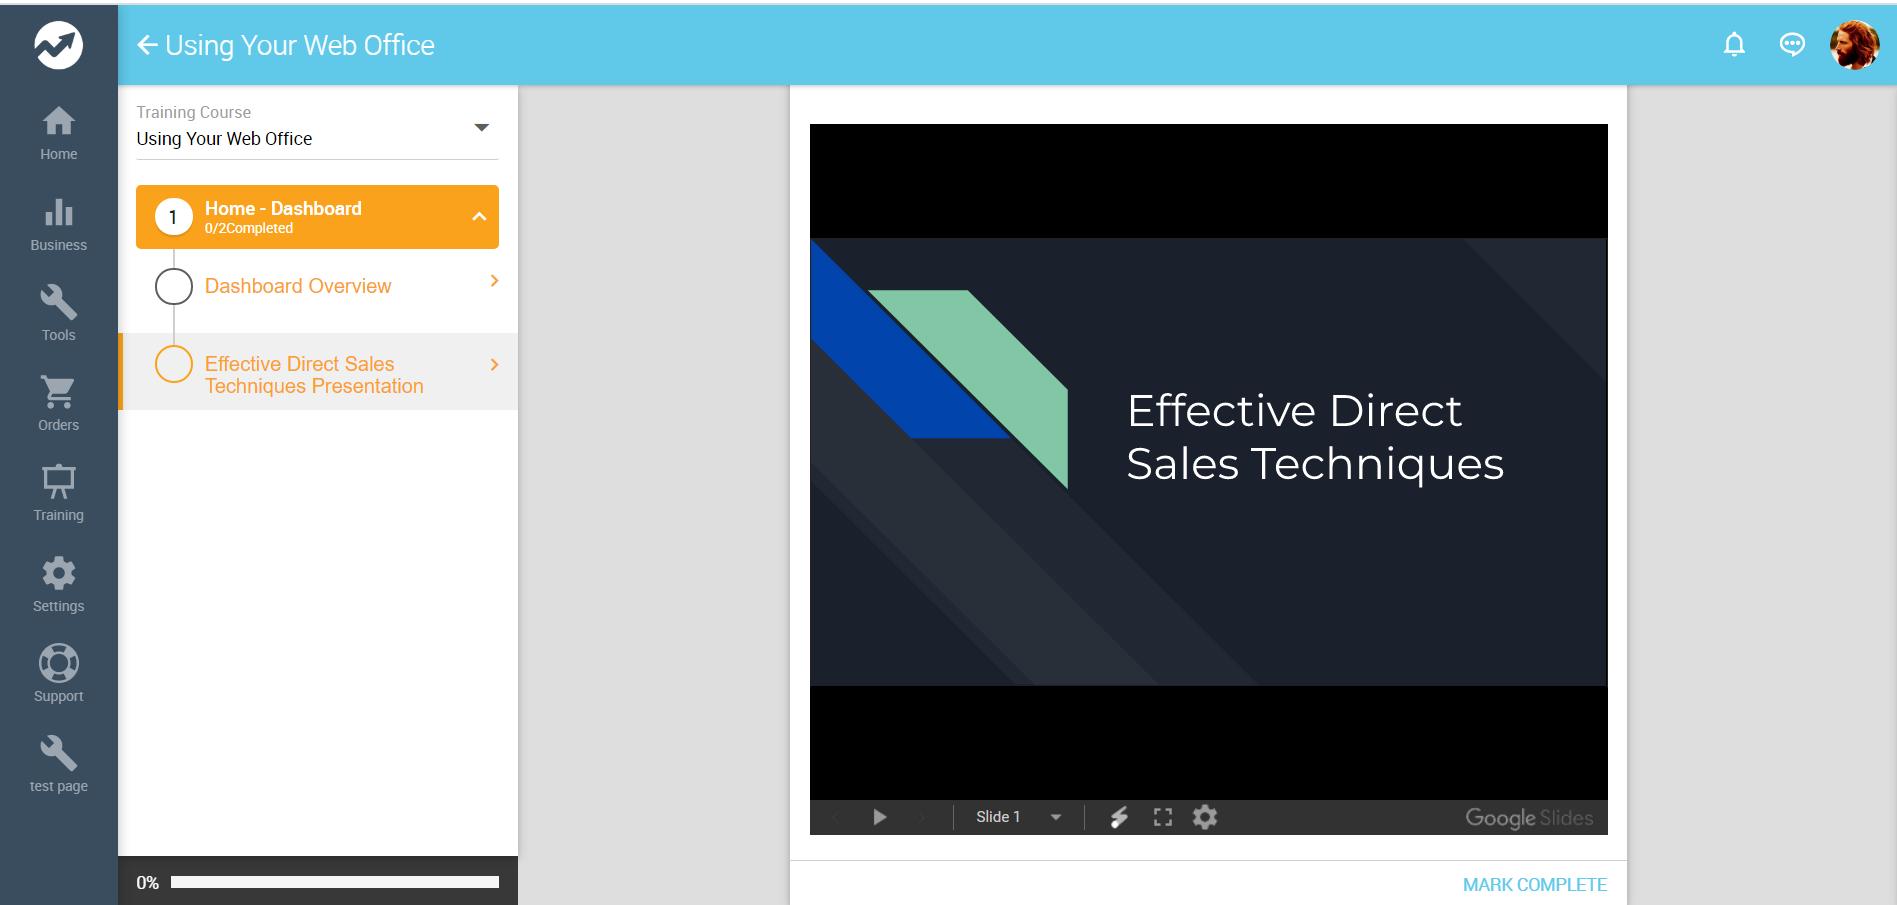 Web Office Training Course Slide